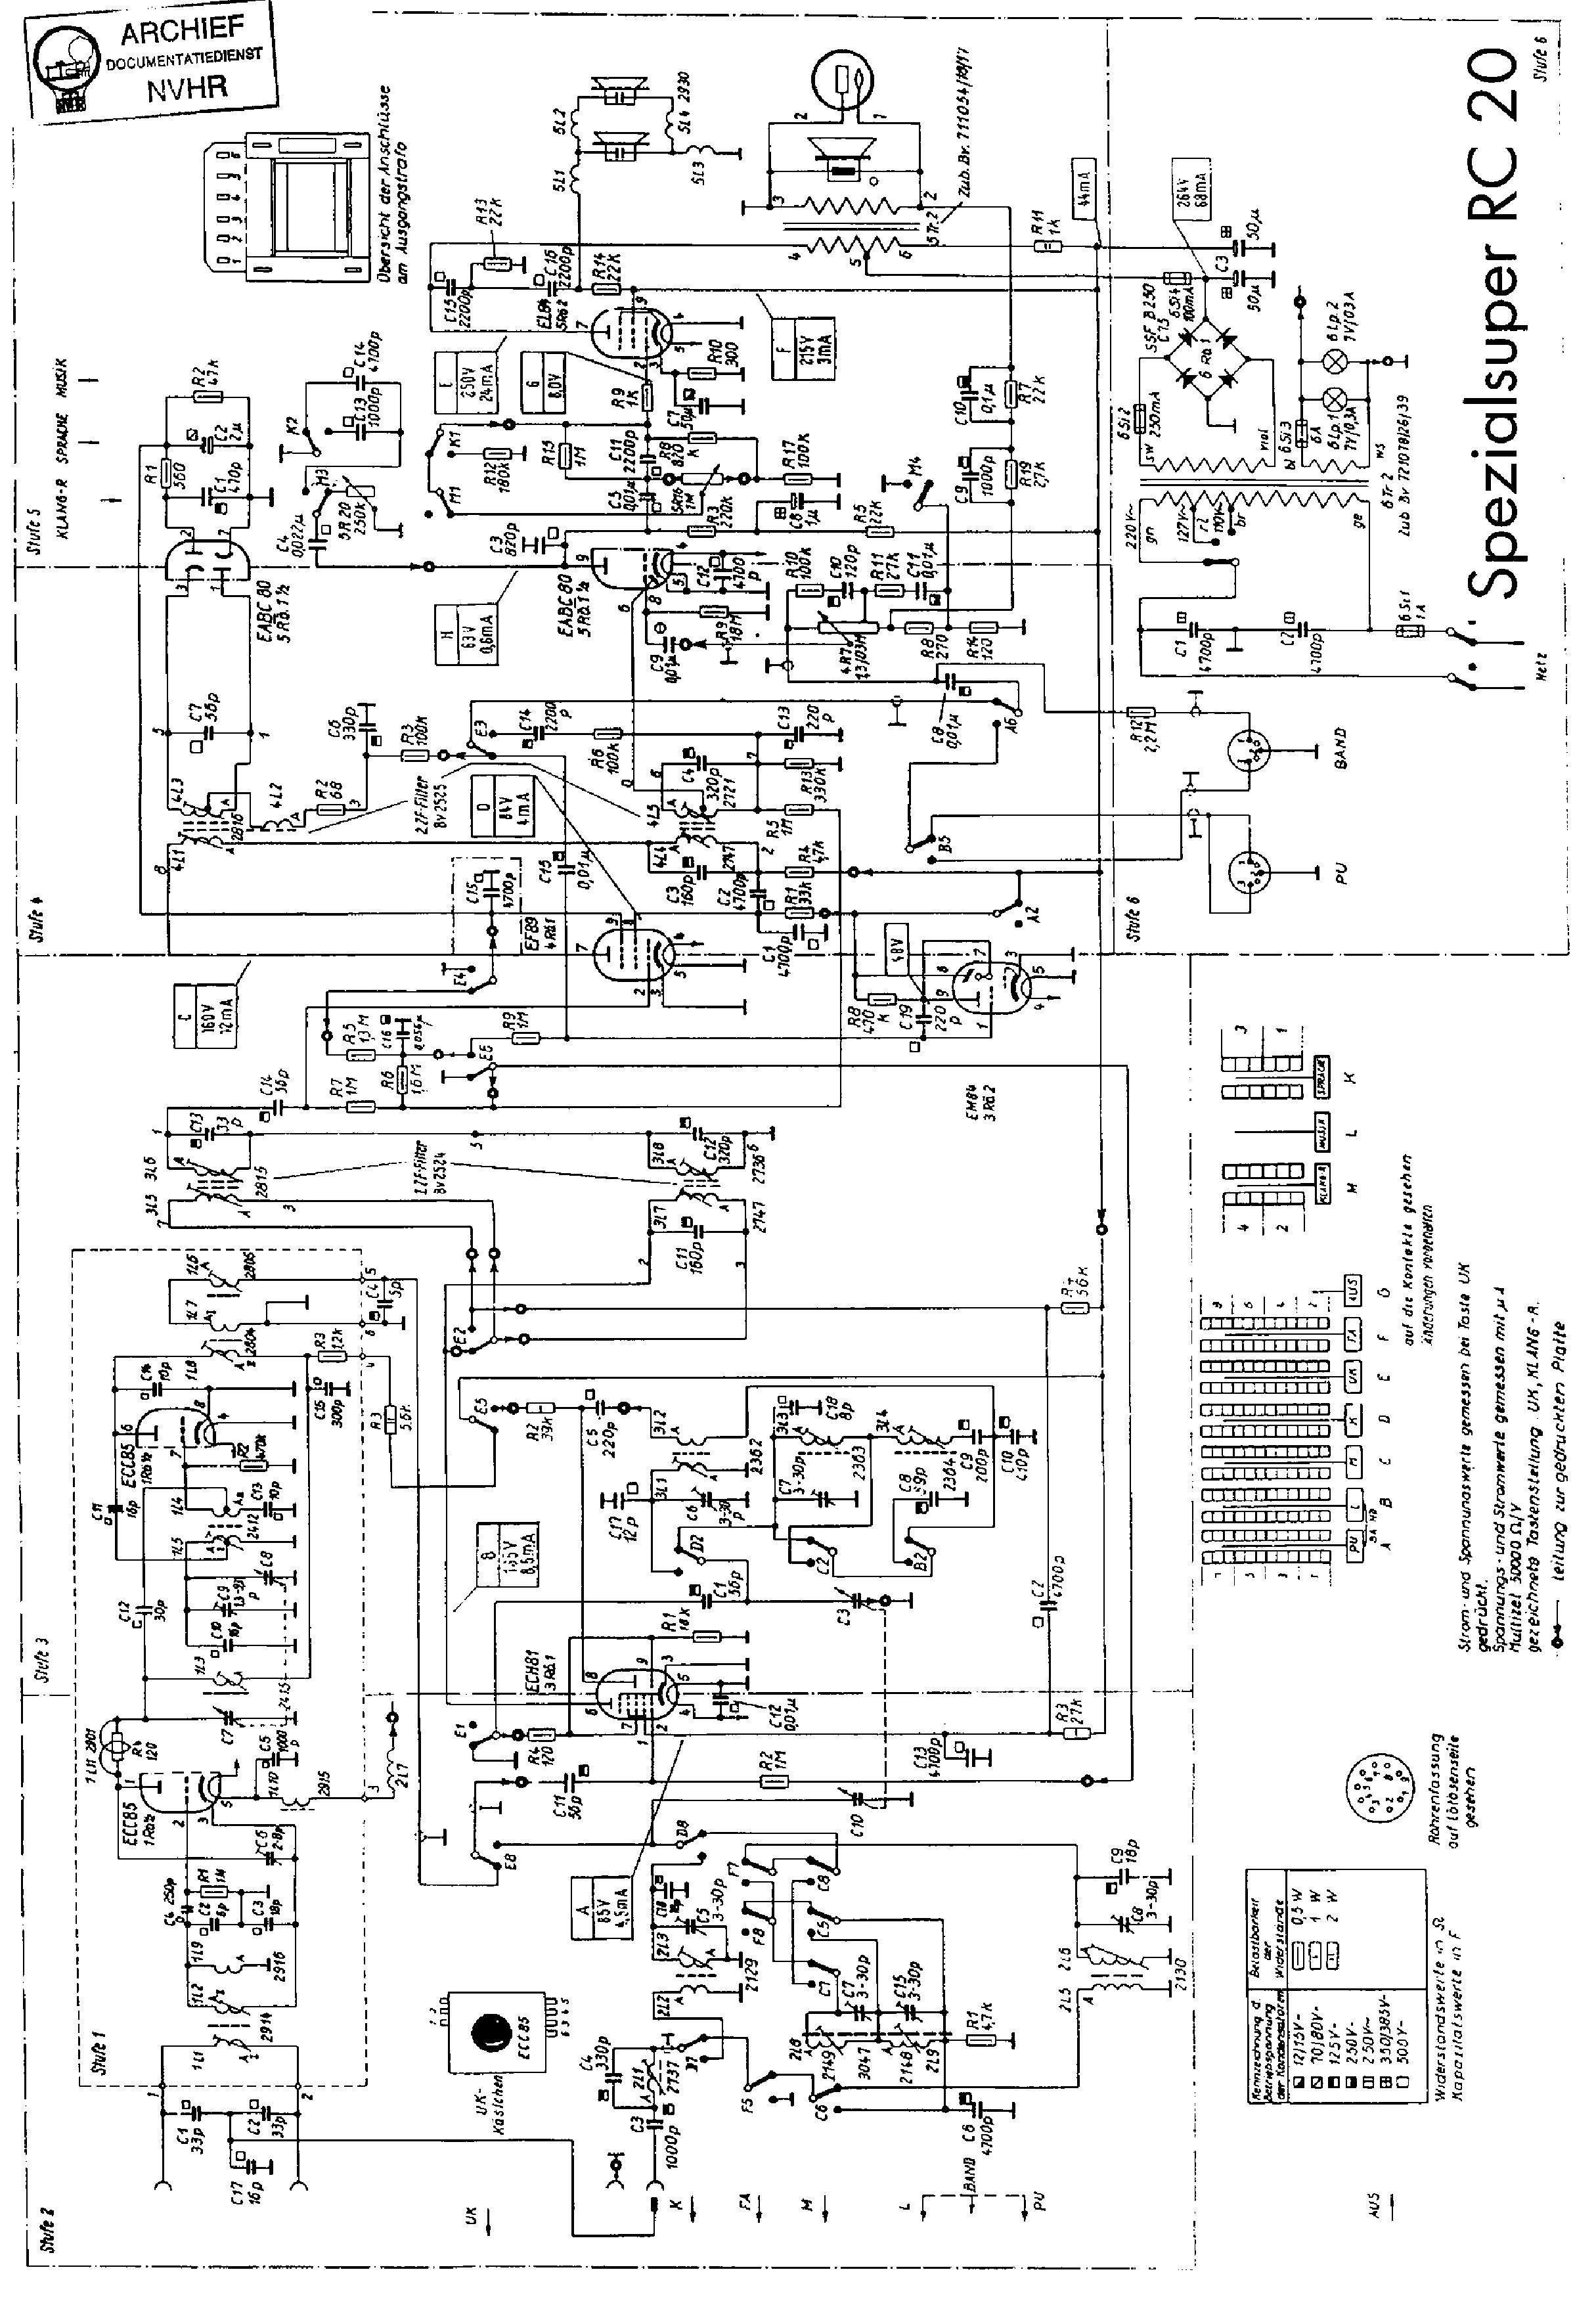 SIEMENS RC20 SPEZIALSUPER AM-FM RECEIVER 1961 SM Service